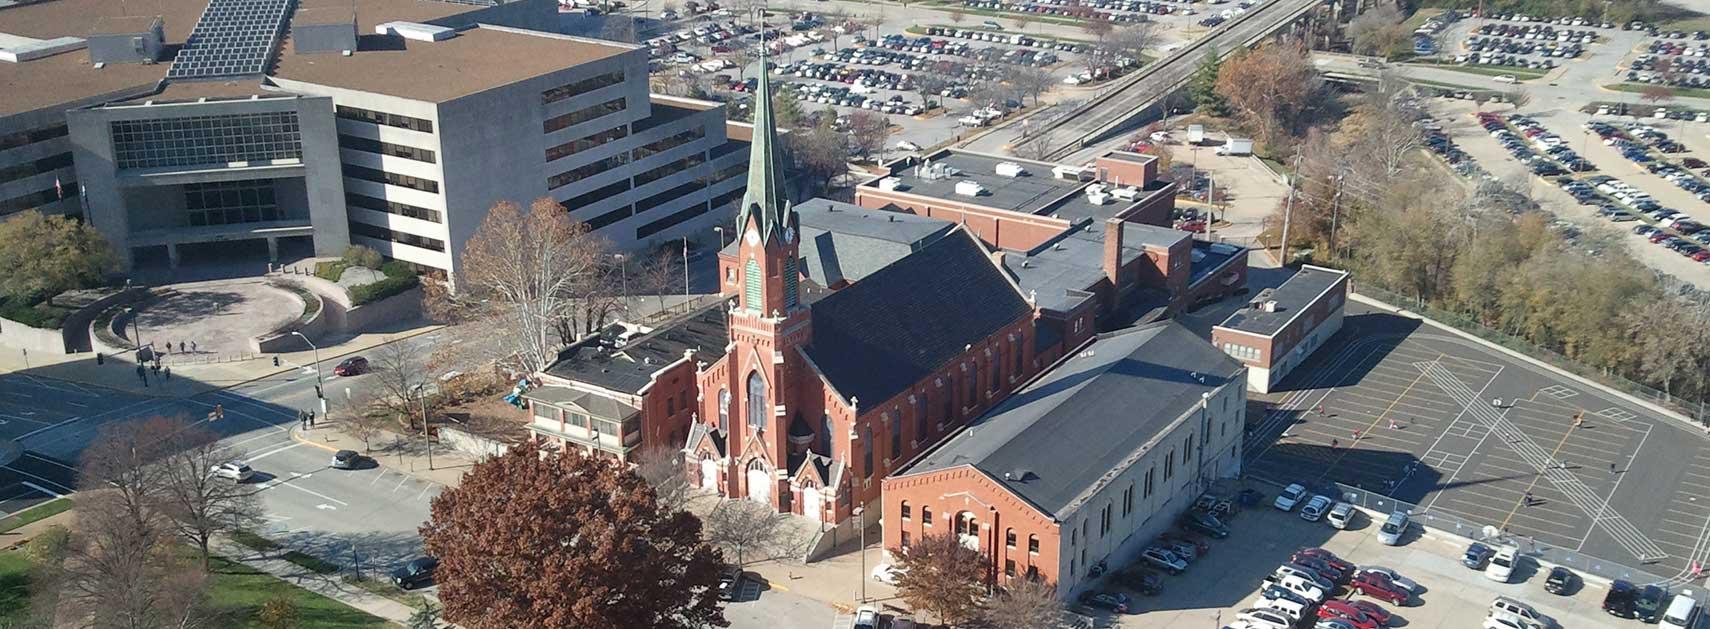 Google Map of Jefferson City Missouri USA Nations Online Project